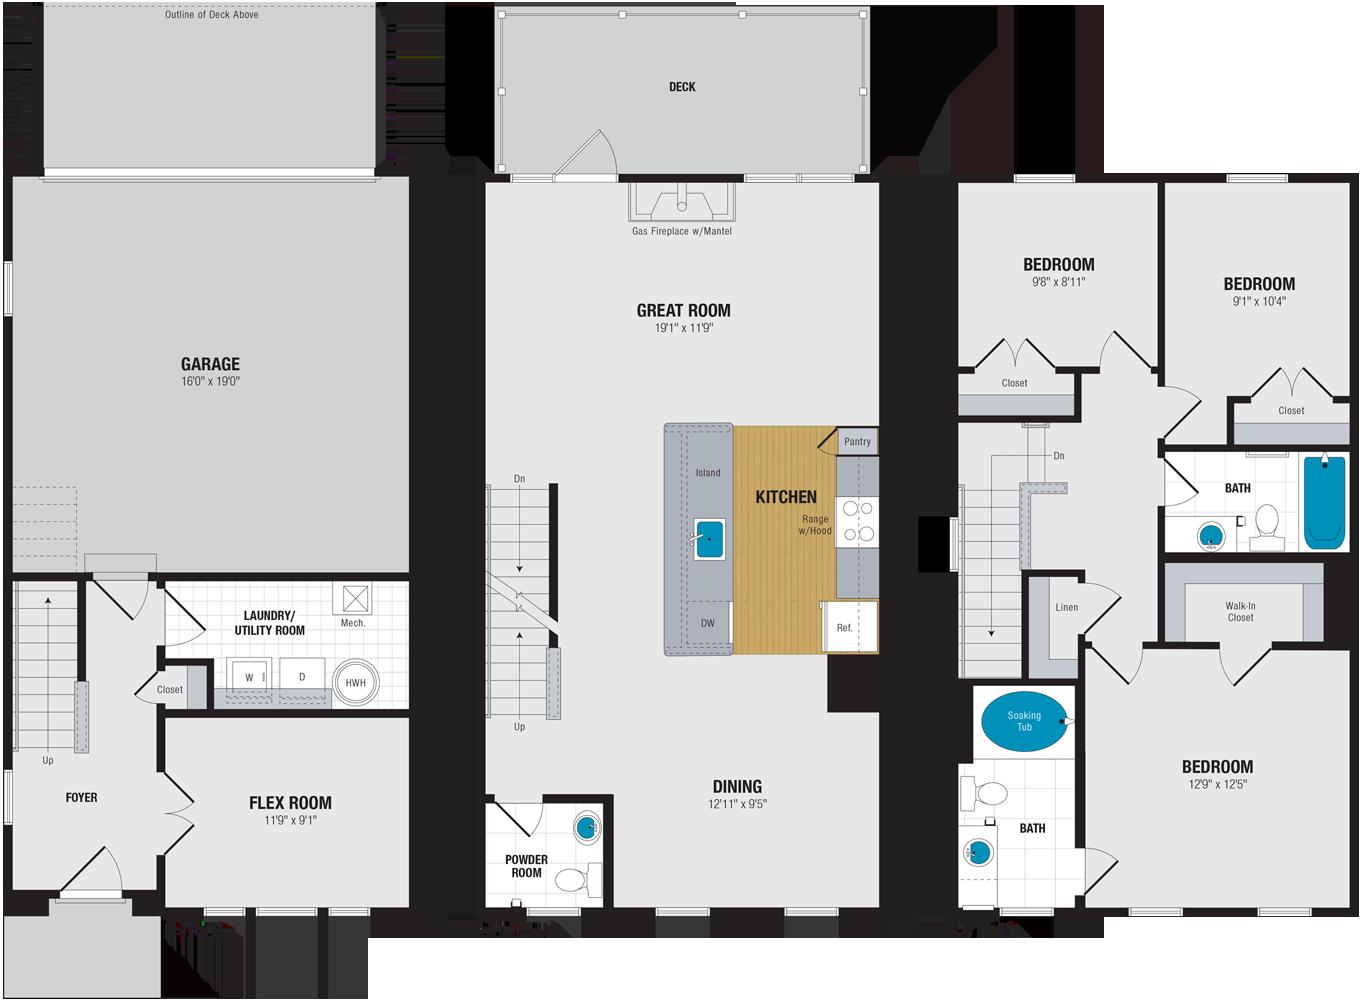 Md abingdon theenclaveatboxhill p0663789 34570722196468 2 floorplan